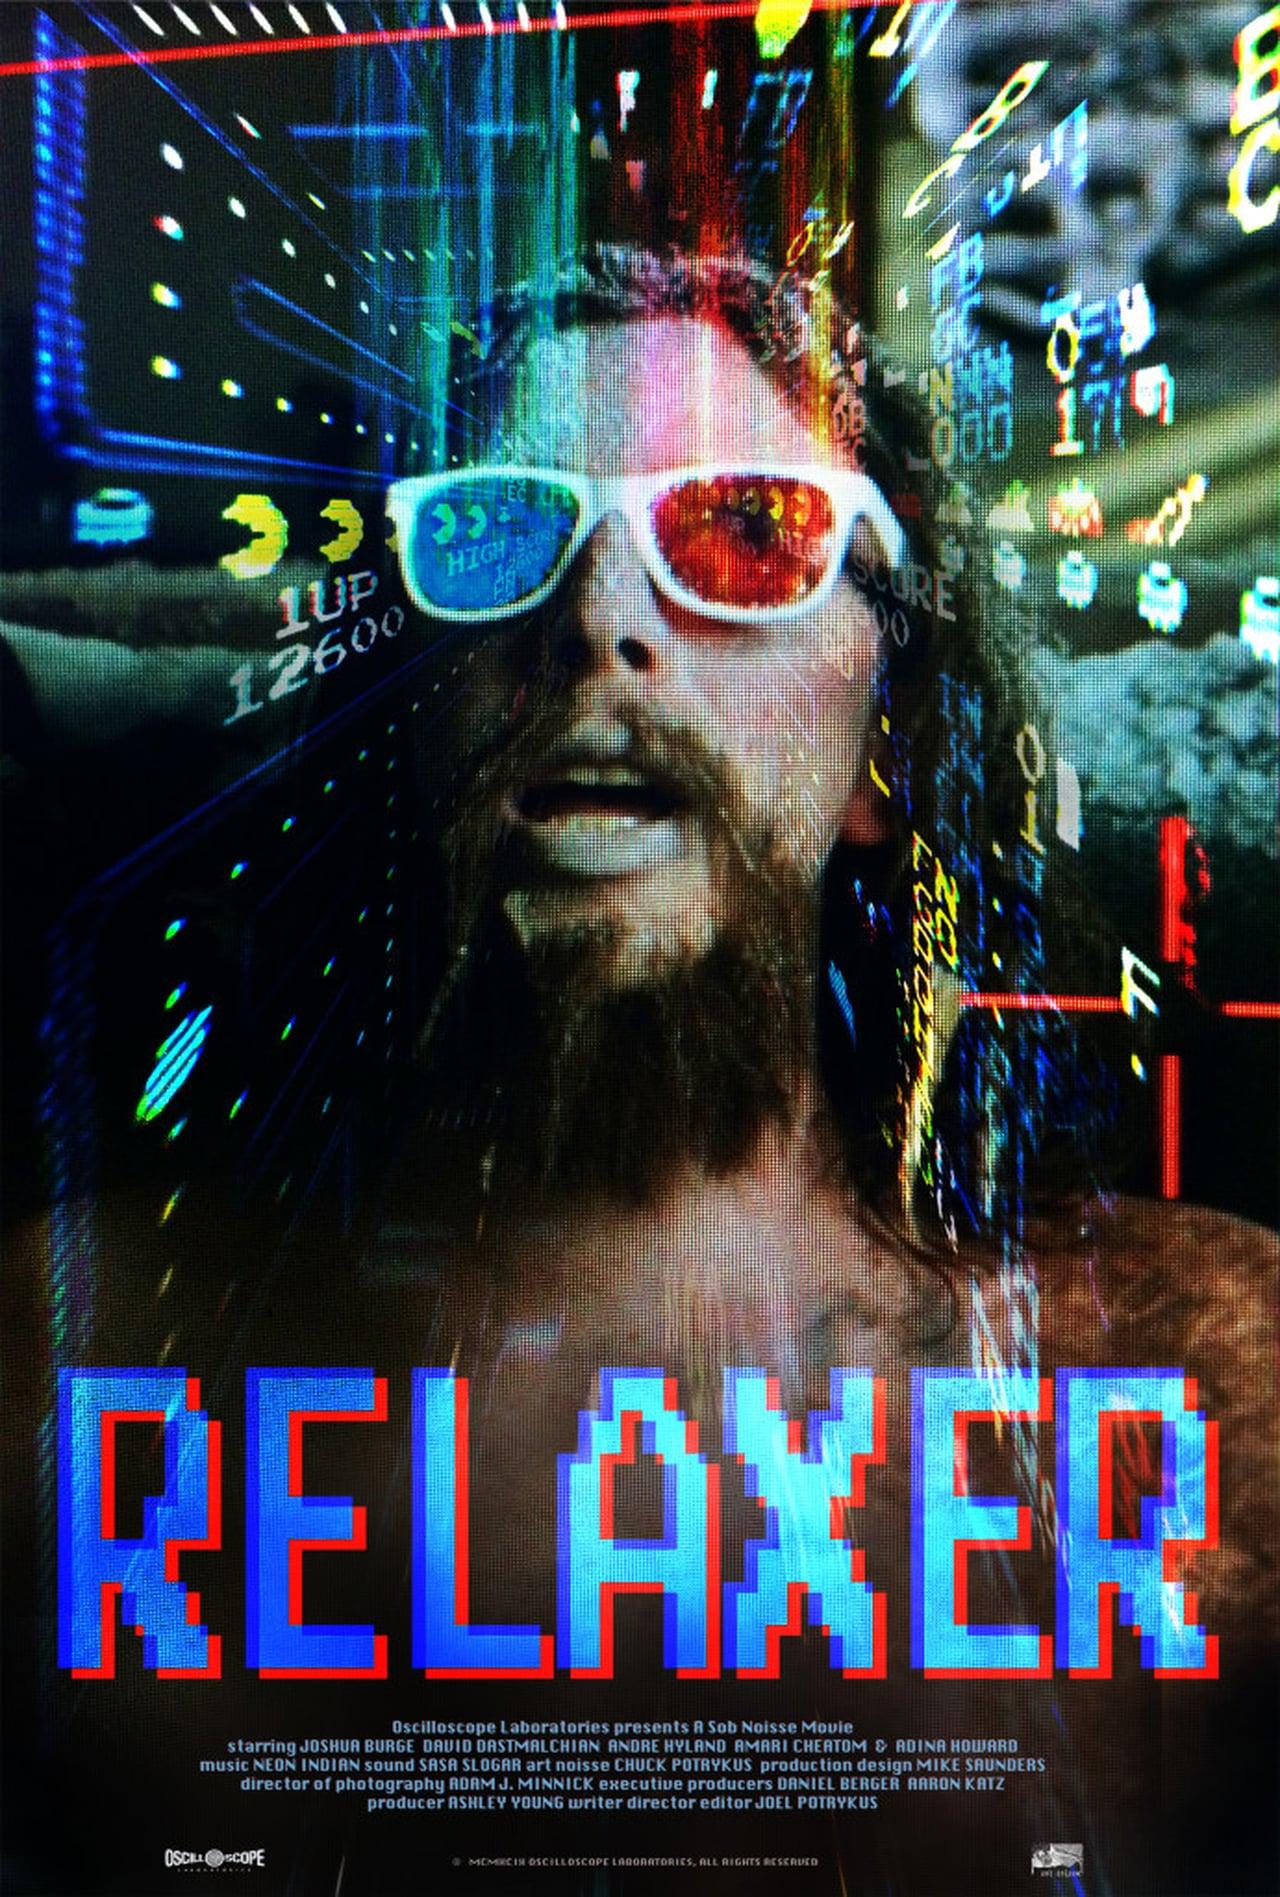 Relaxer film review: a fantastically grubby genre-bending slacker comedy